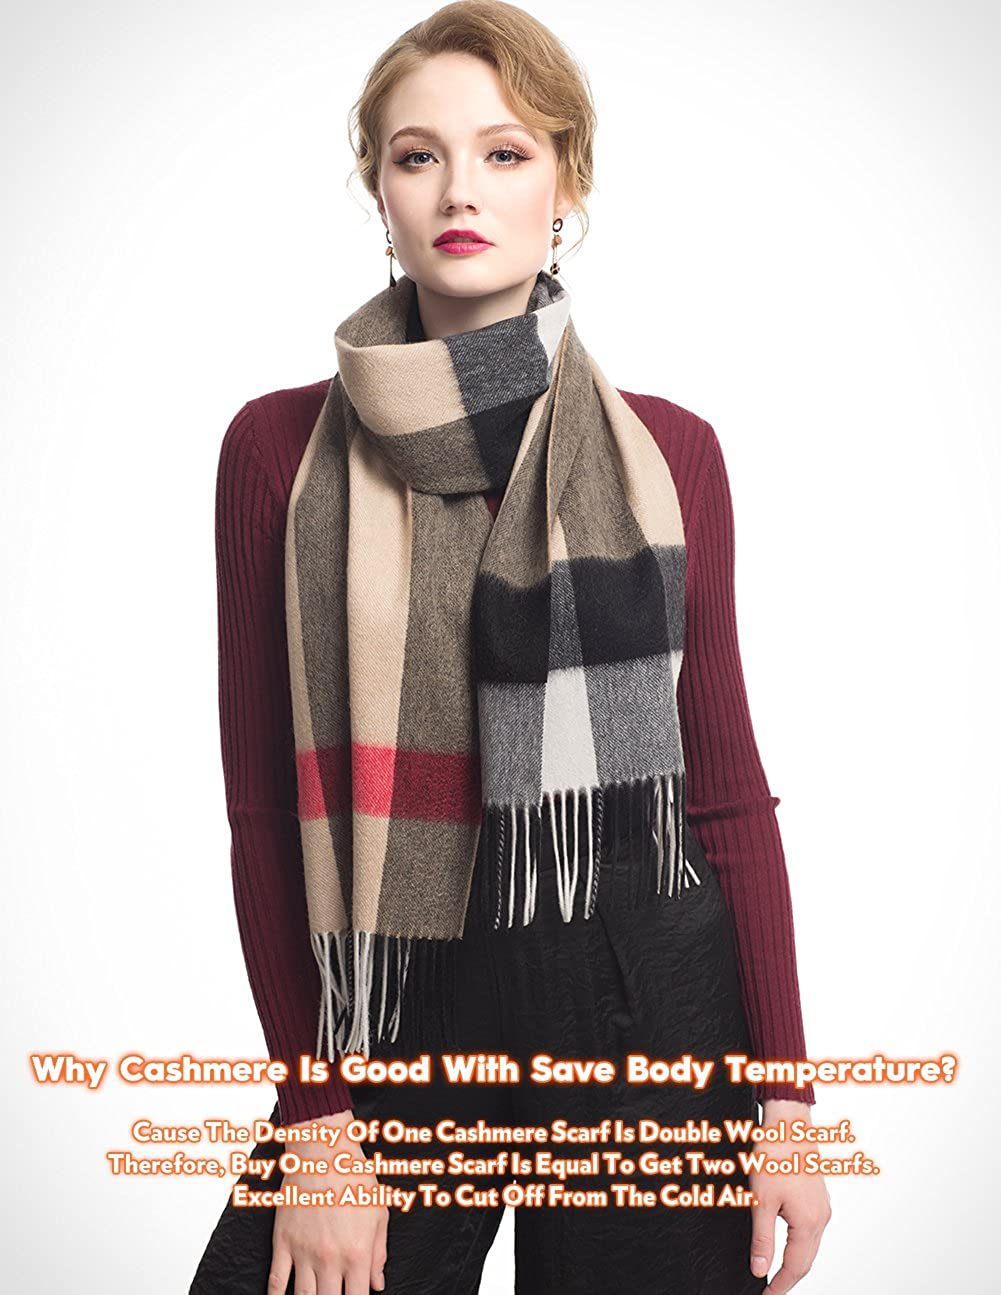 bc01bad48 STORY OF SHANGHAI Womens Handmade Plaid Cashmere Scarf Warm Winter Fringe Wool  Scarf at Amazon Women's Clothing store: